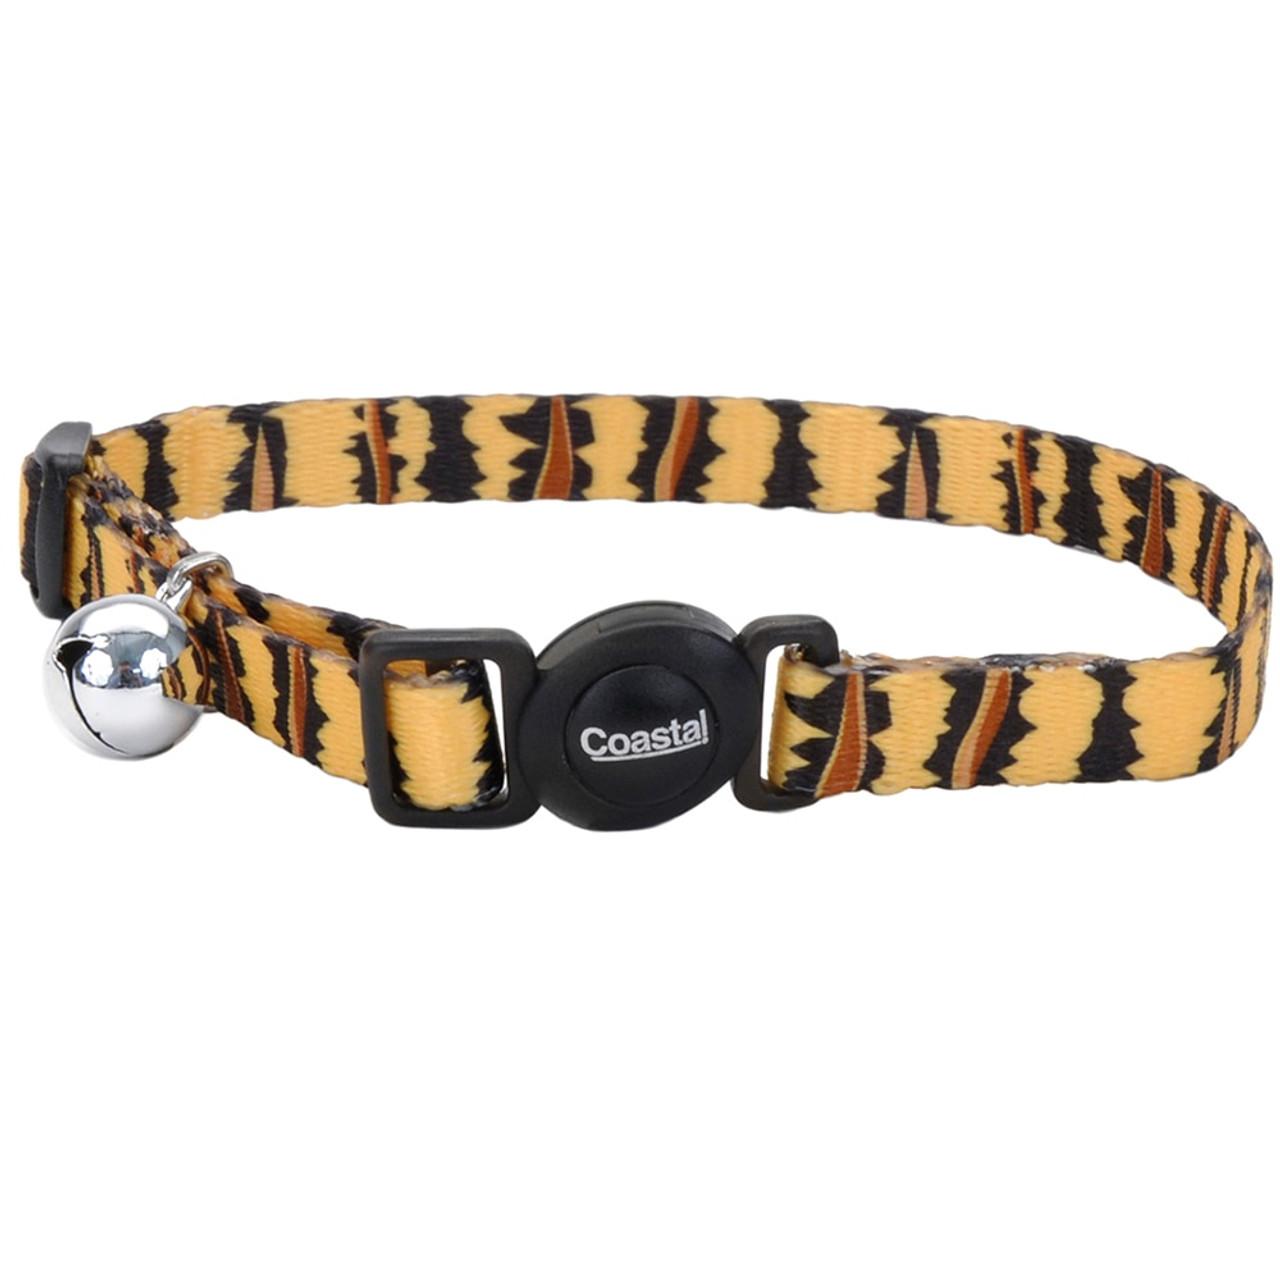 Coastal Pet Fashion Adjustable Breakaway Cat Collars